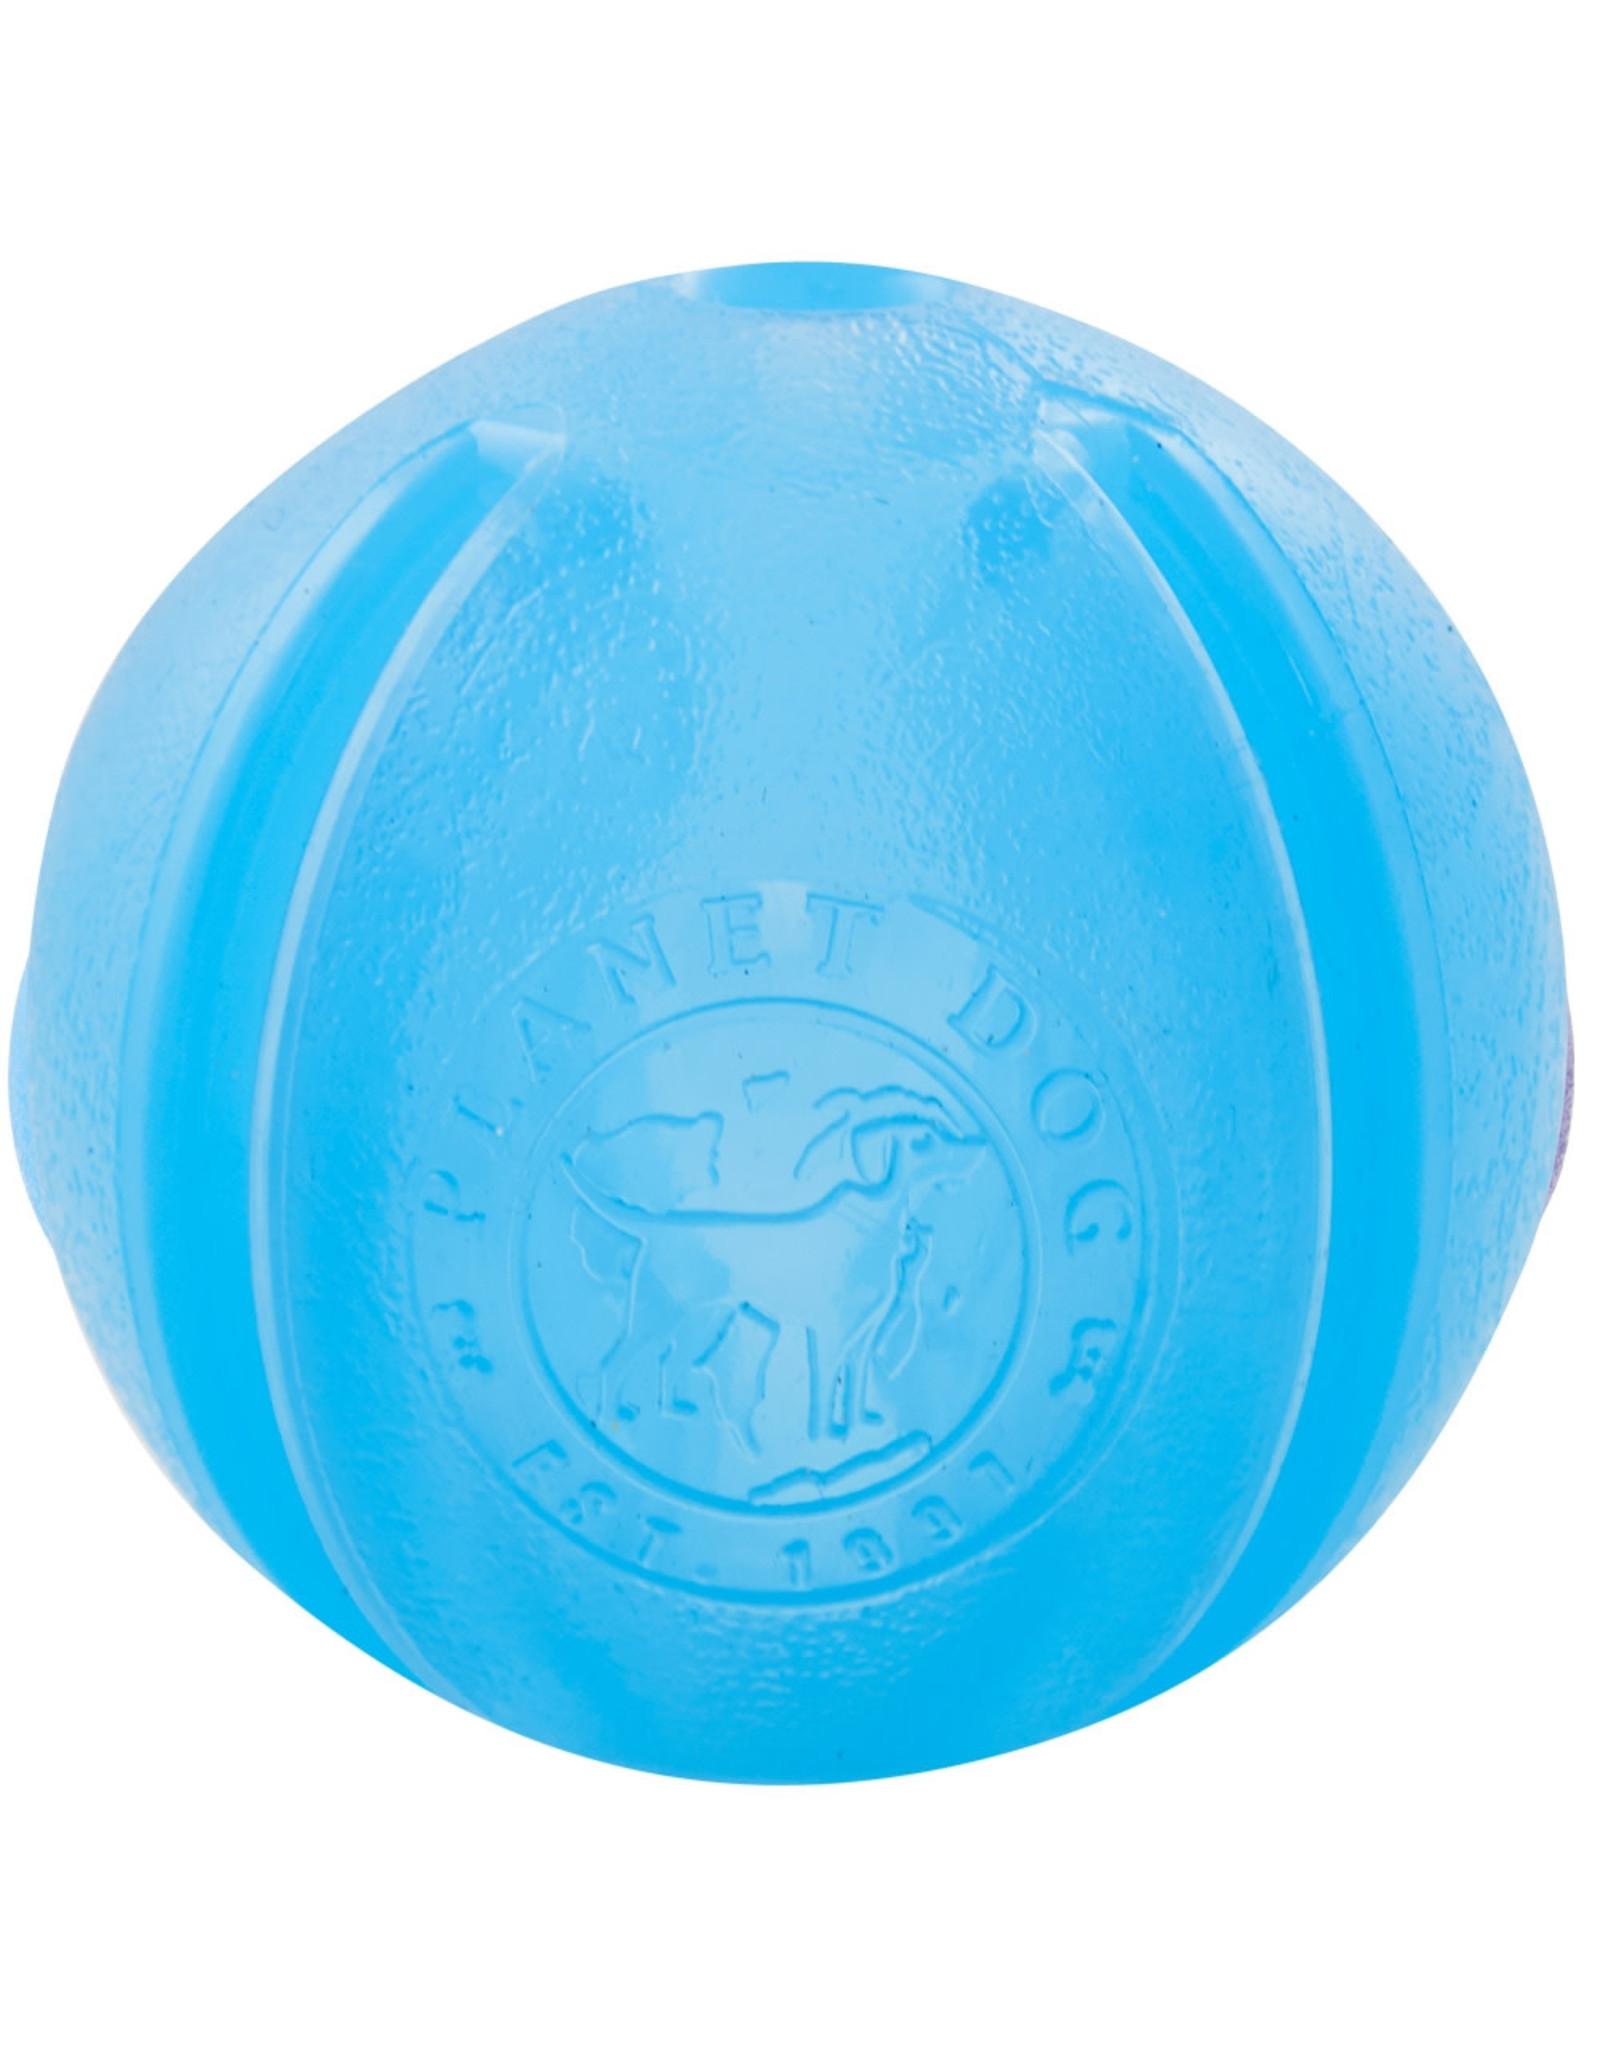 Planet Dog Planet Dog Orbee-Tuff GuRu: Blue, 4 in